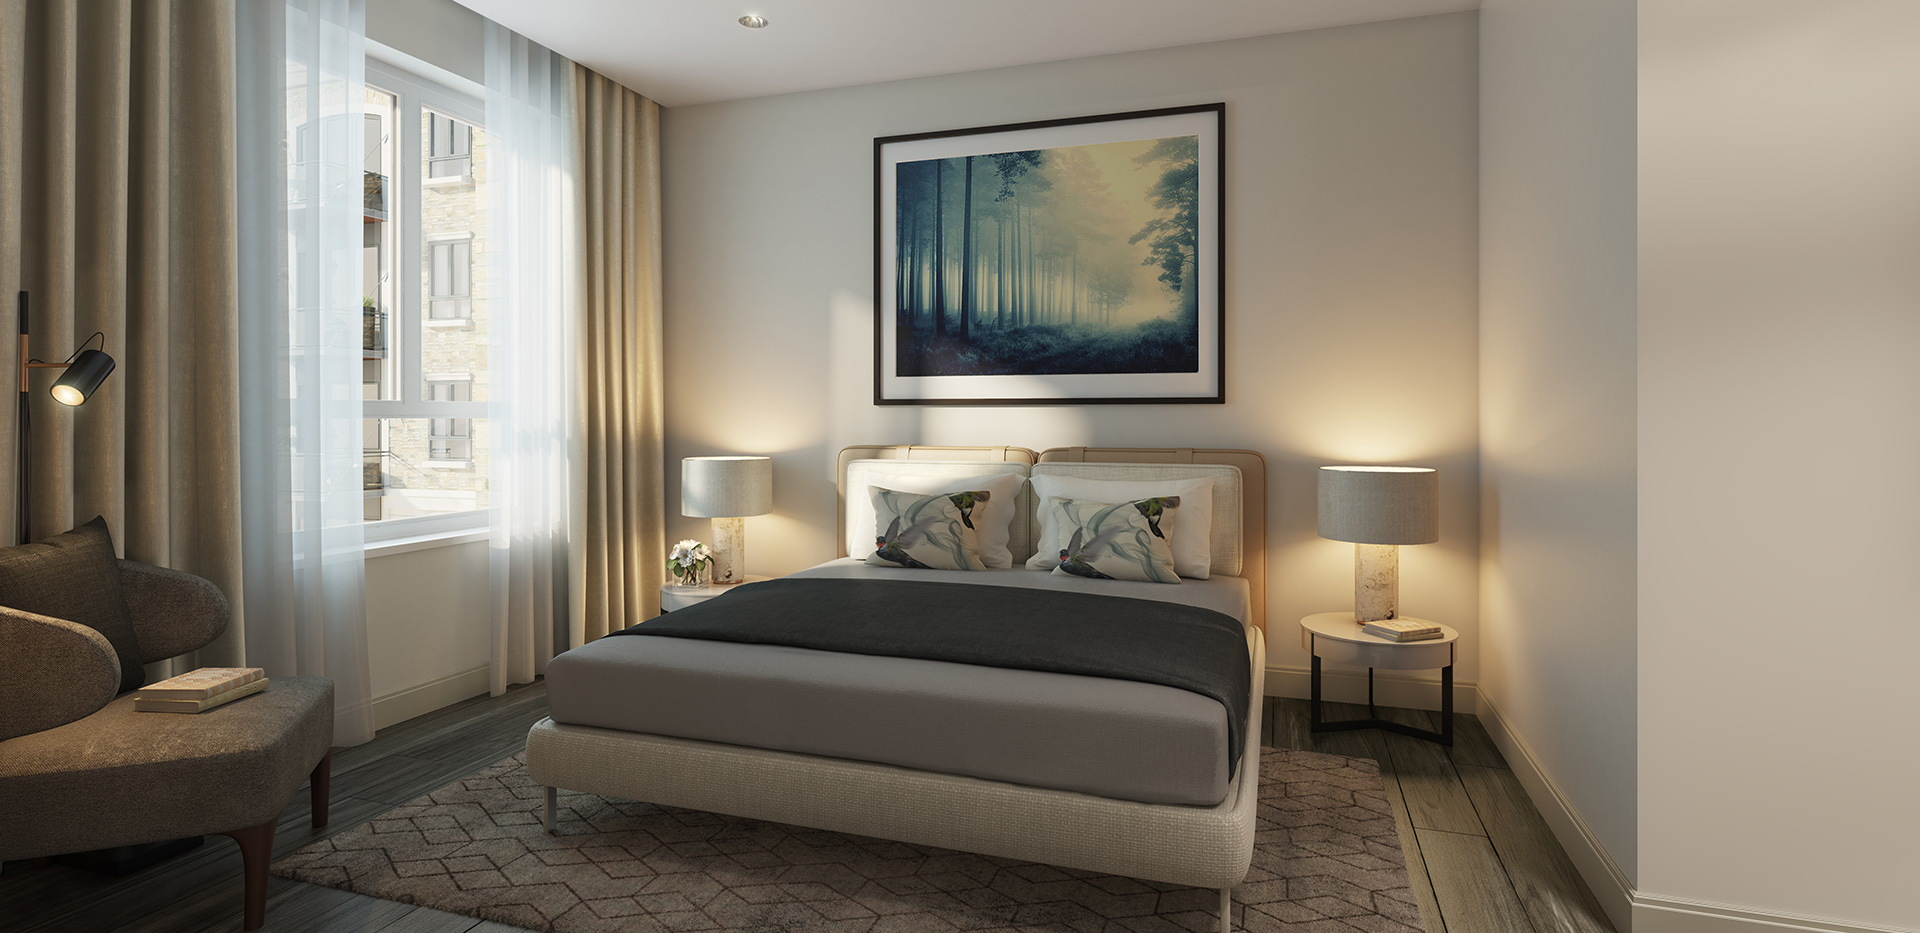 Berkeley, Chiswick Gate, Apartments, Bedroom, Internal